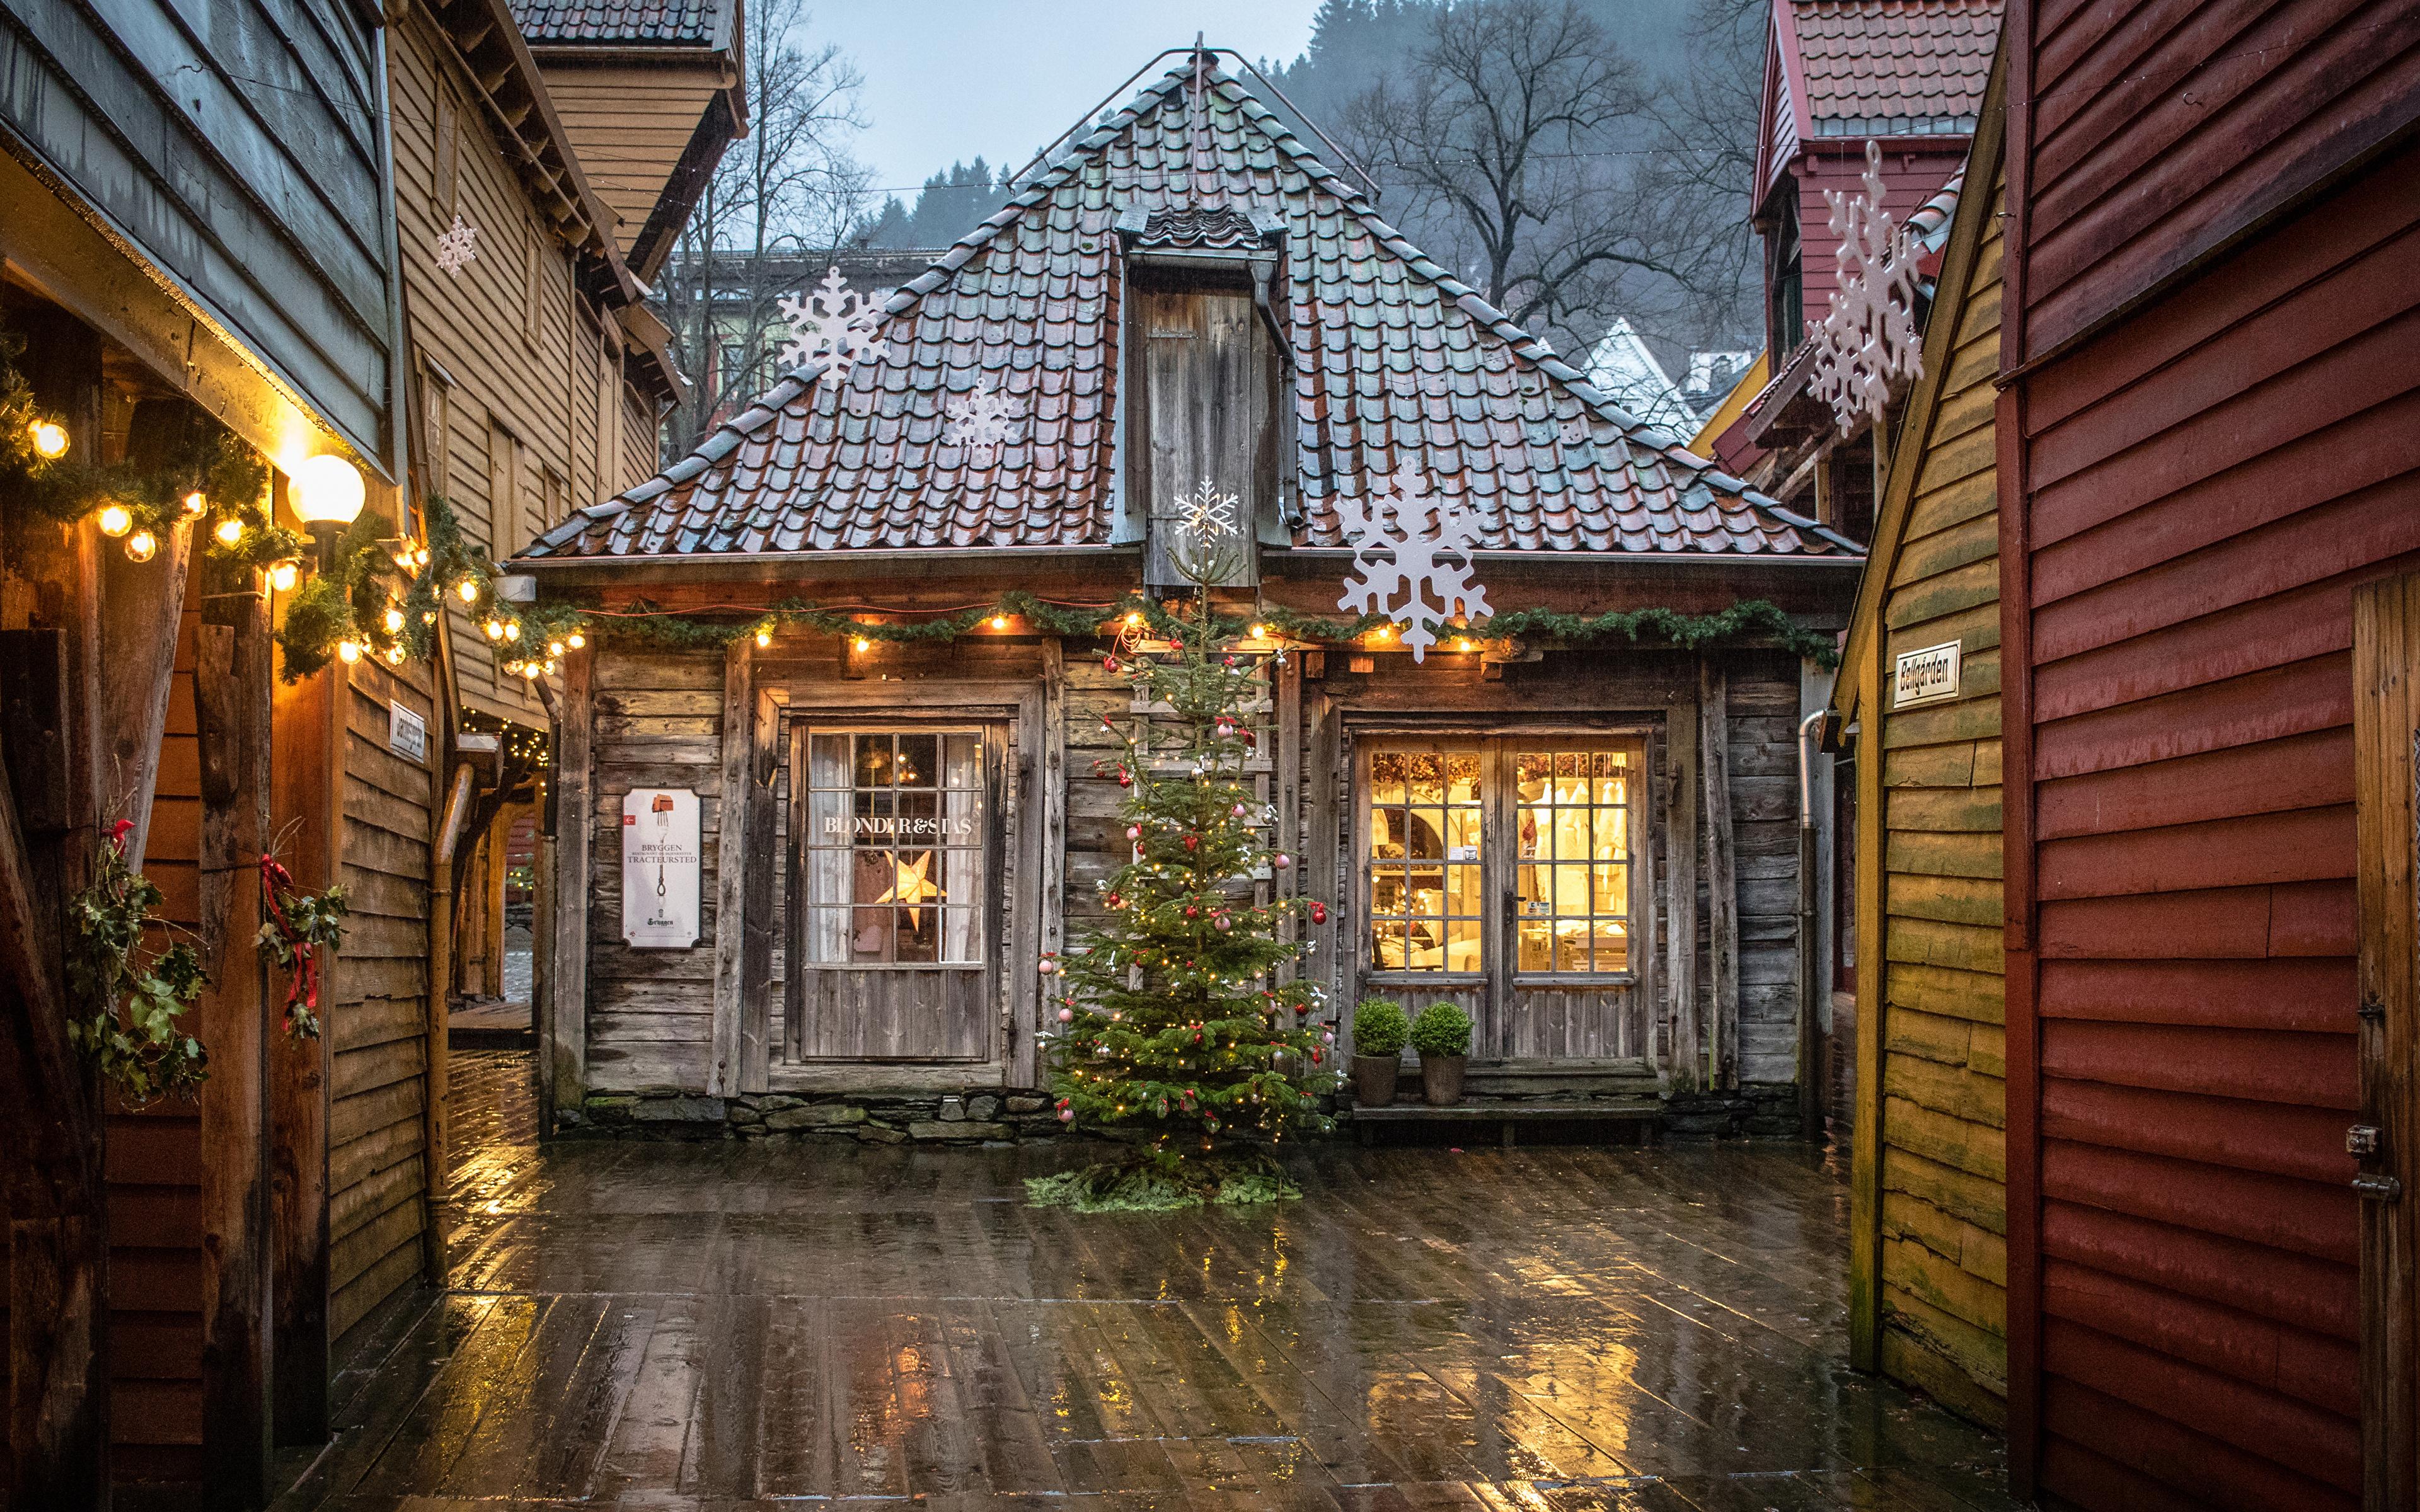 Christmas In Norway.Image Cities Norway Christmas Bryggen Bergen Fairy Lights